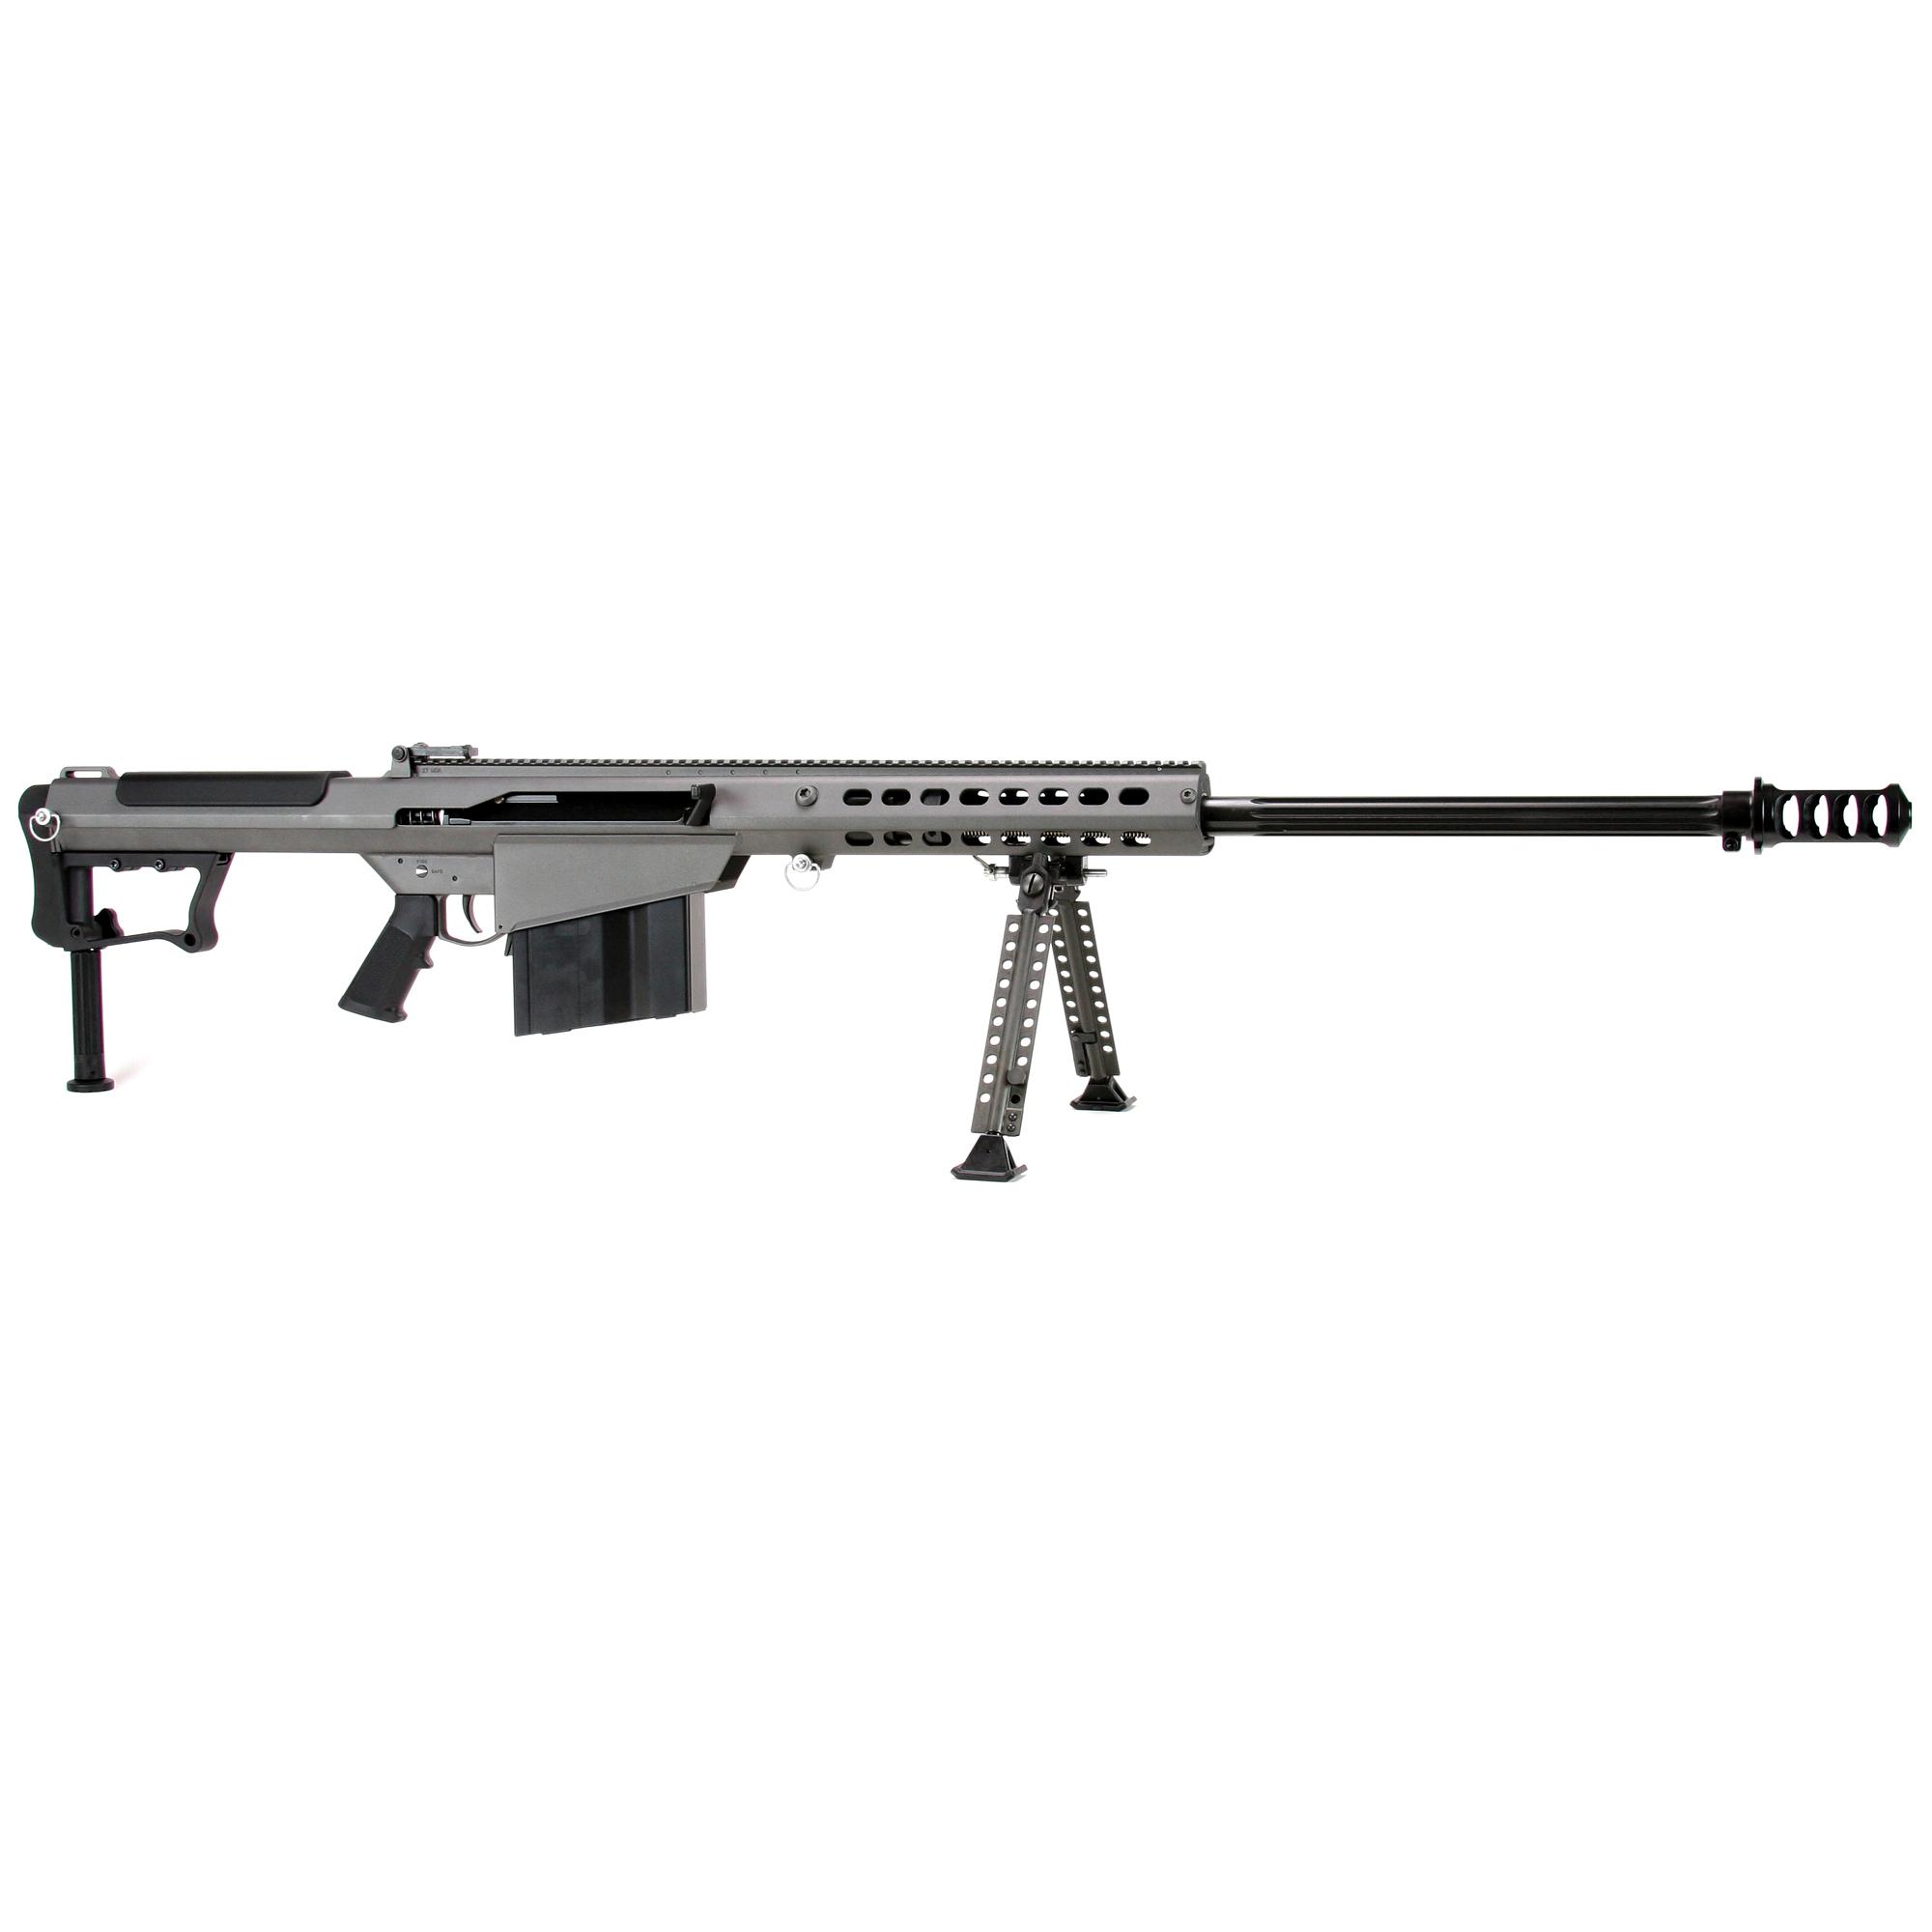 "Barrett M107a1 50bmg 29"" Gry 10rd"